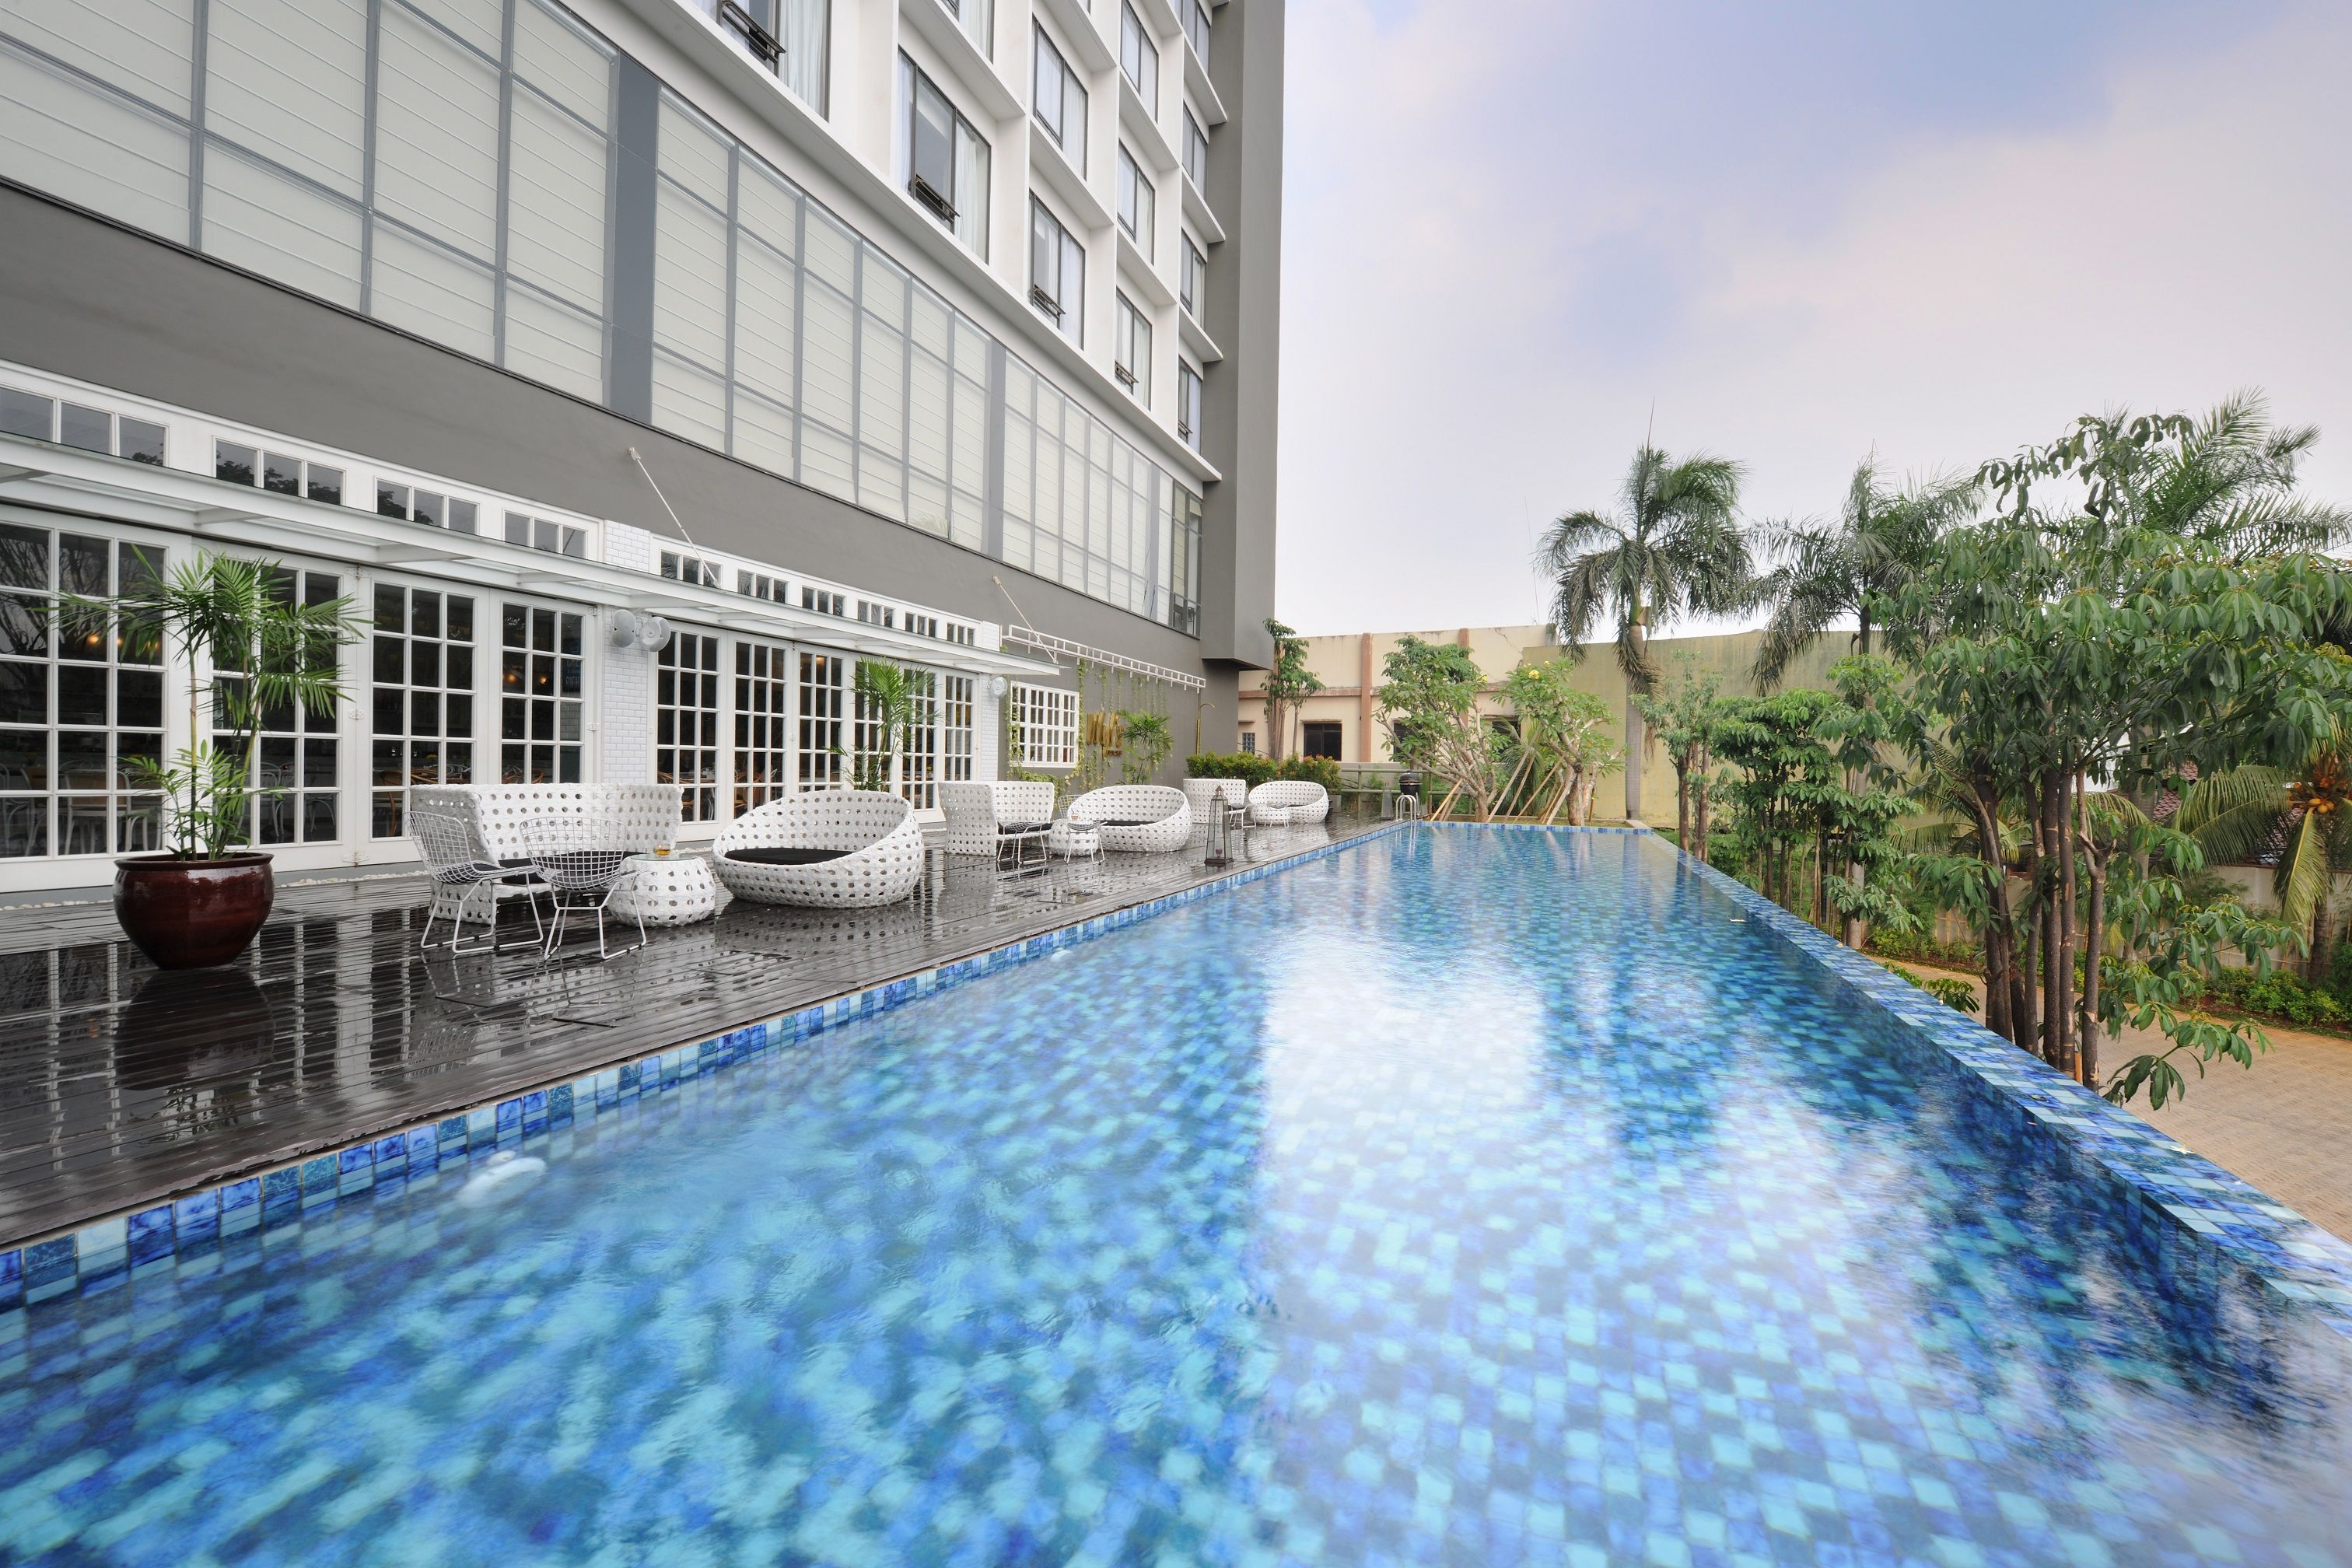 Veranda Hotel @ Pakubuwono by Breezbay Japan, Jakarta Selatan